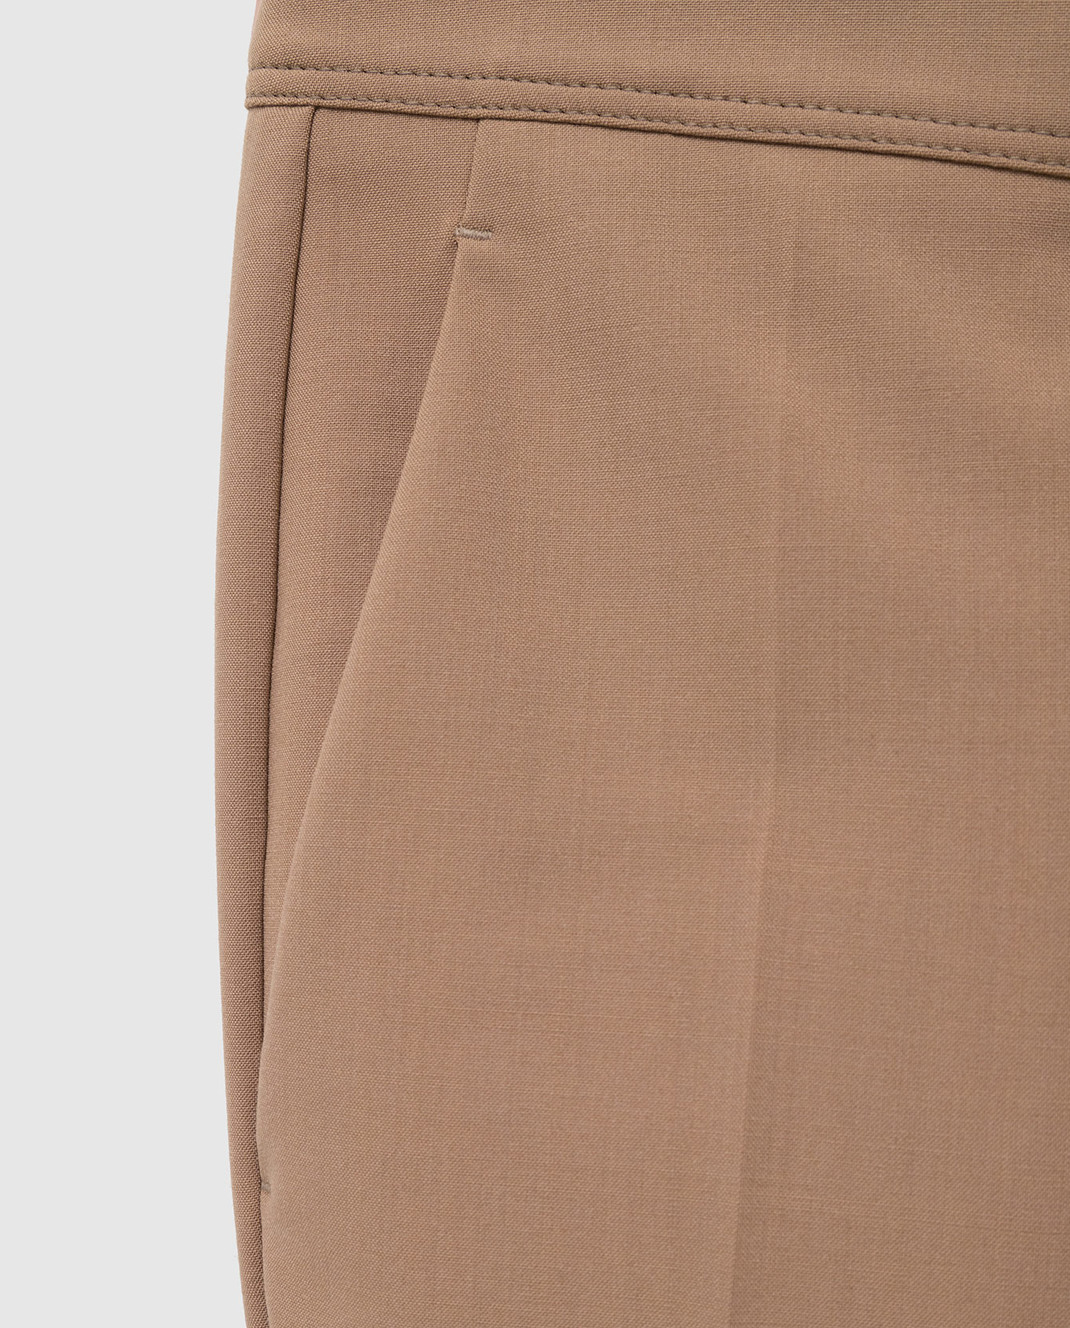 Brunello Cucinelli Бежевые брюки MA124P7227 изображение 5